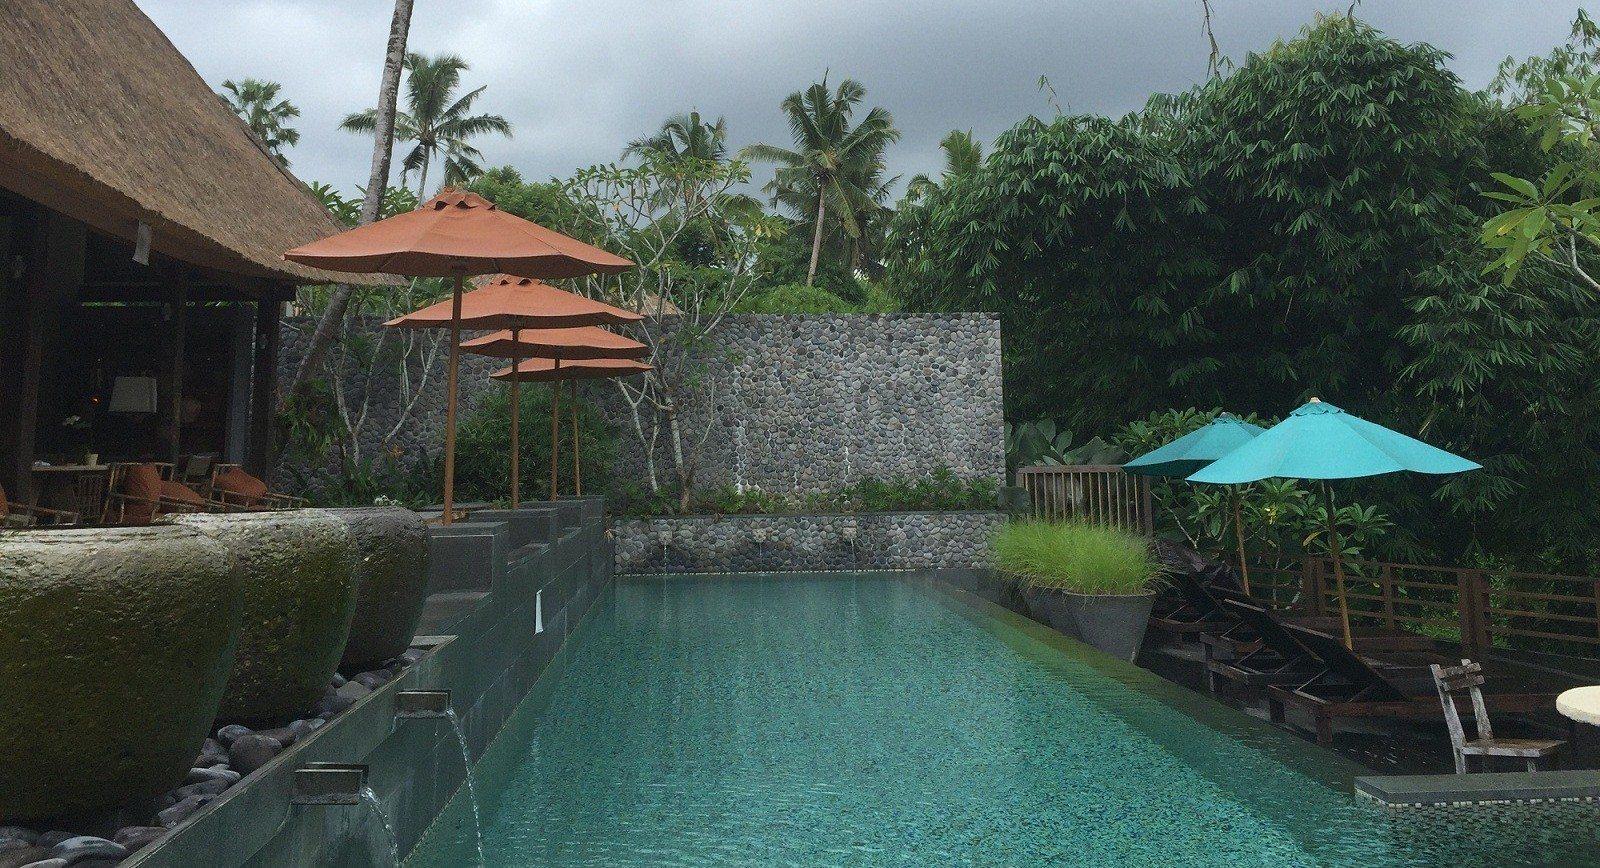 Finding Zen at The Purist Villas in Ubud